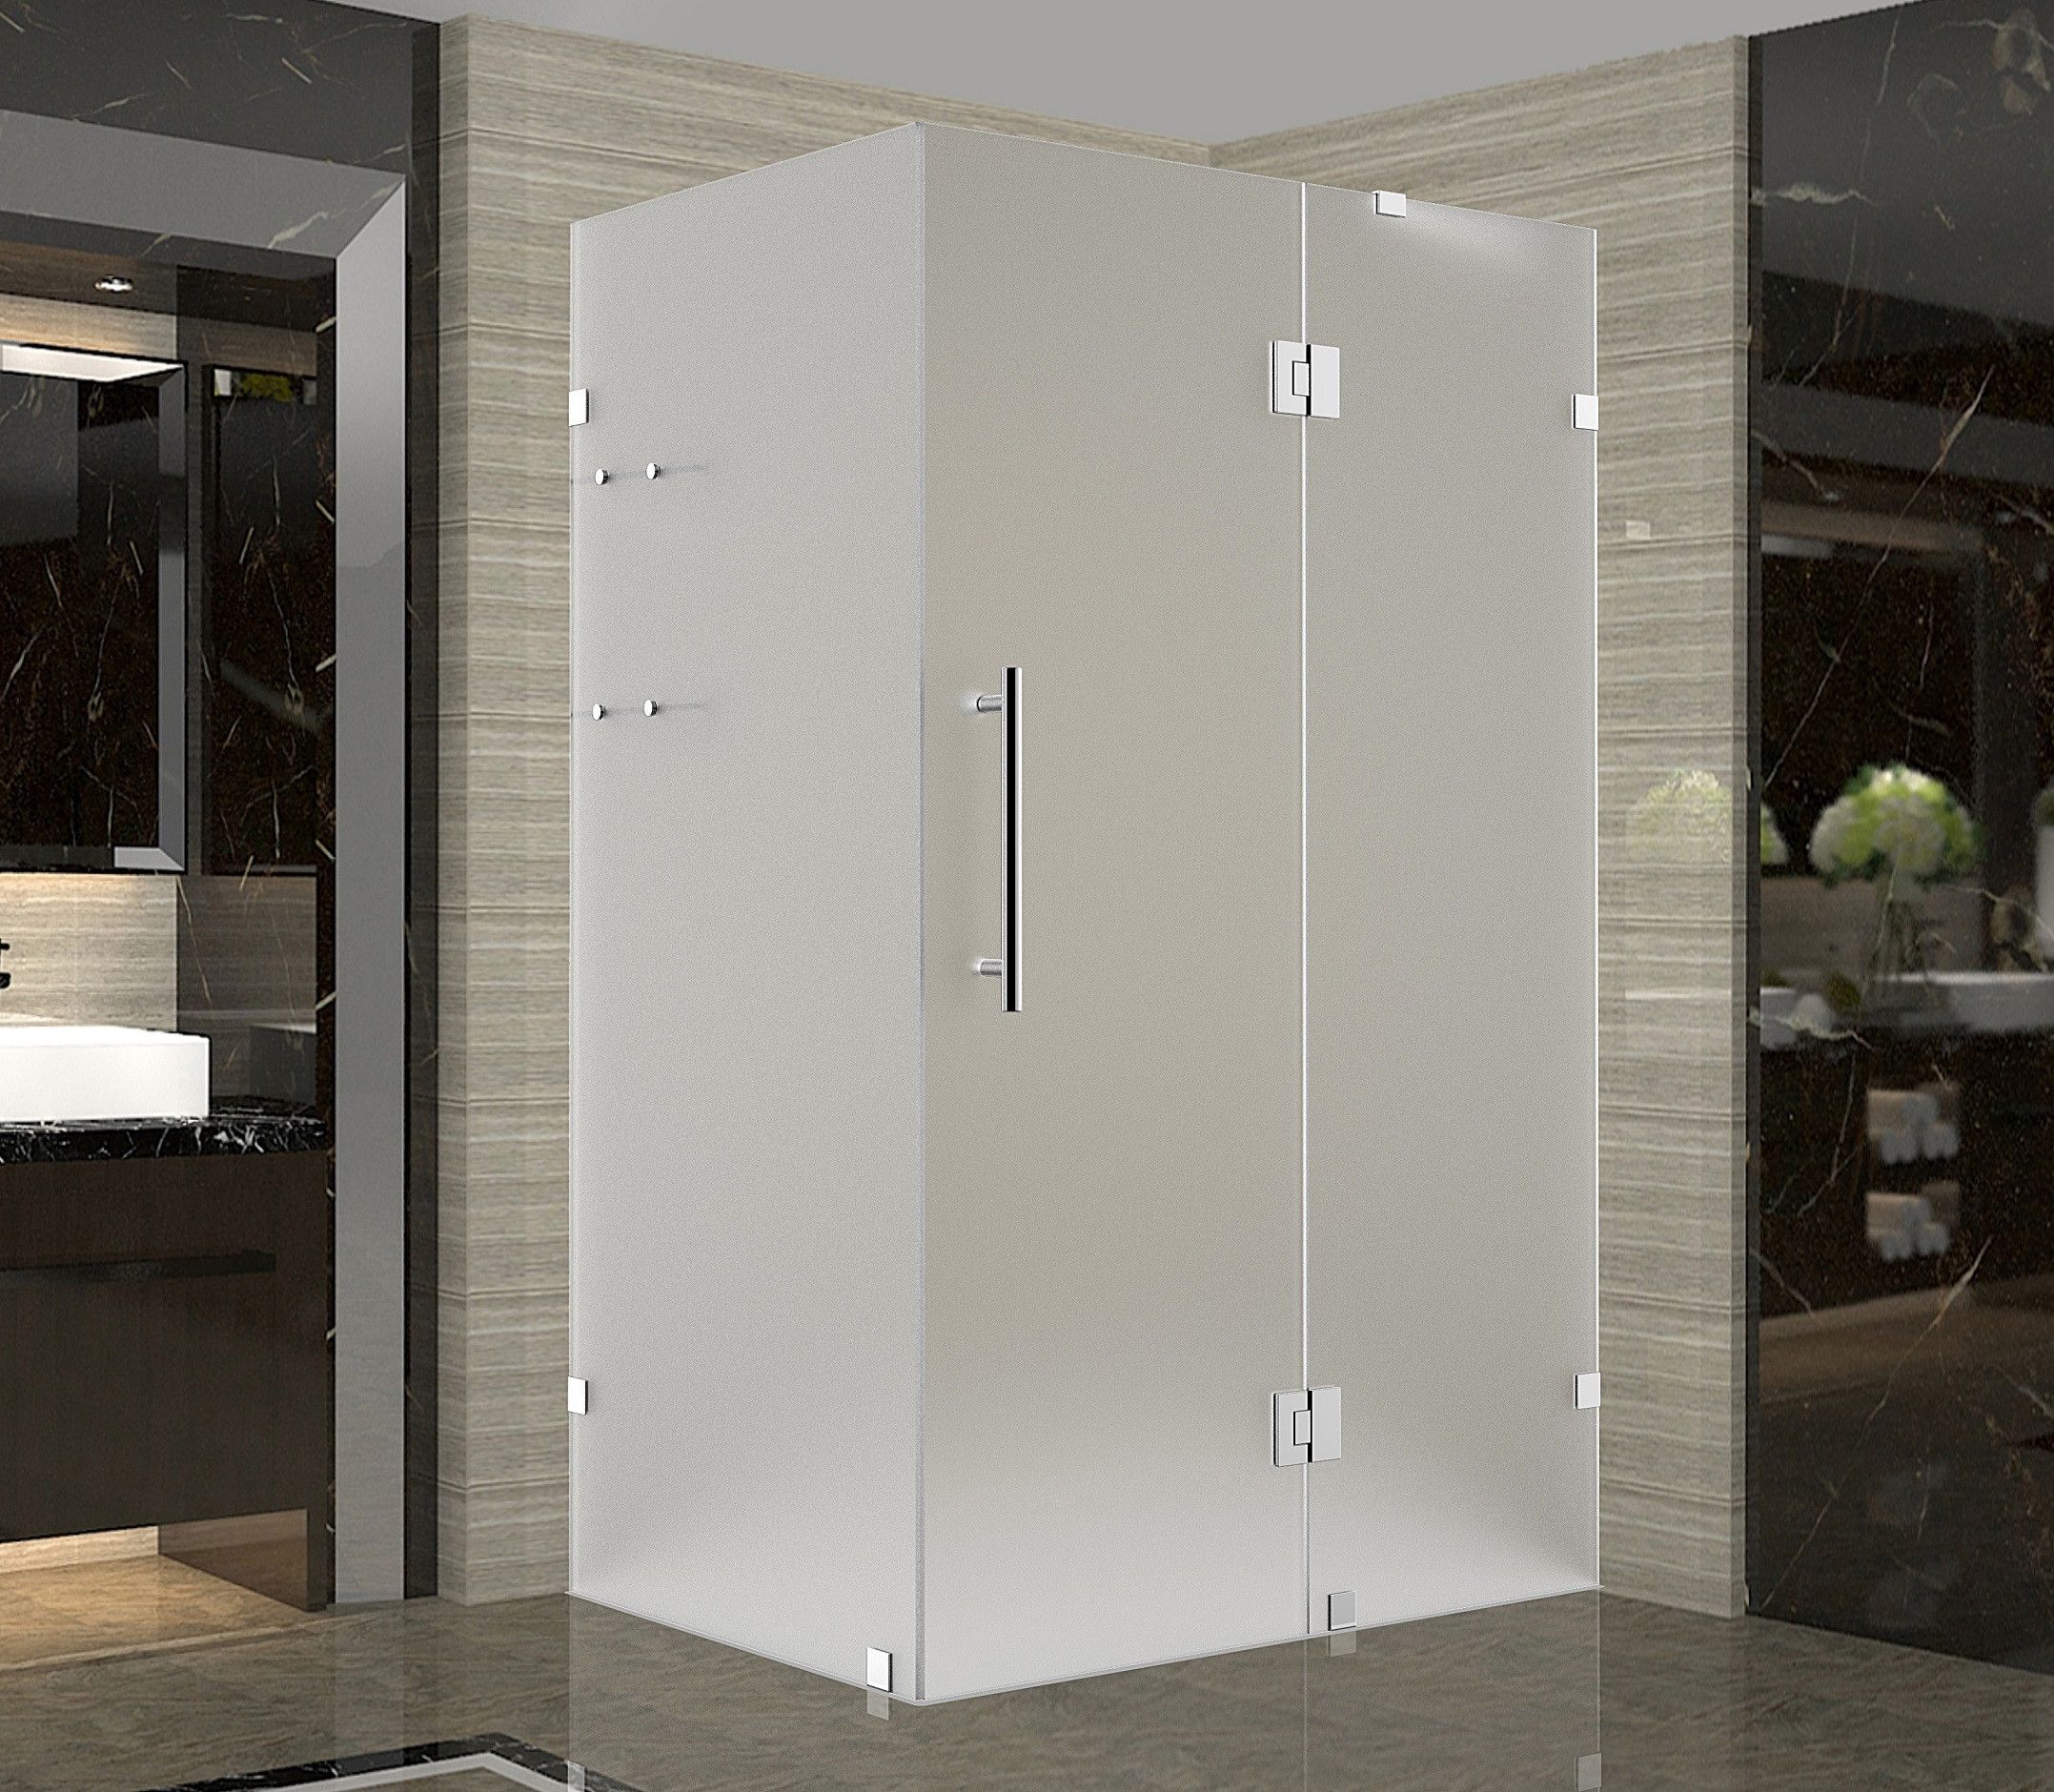 Aston Global SEN992F-SS-3232-10 Stainless Steel Completely Frameless Frosted Glass Shower Enclosure